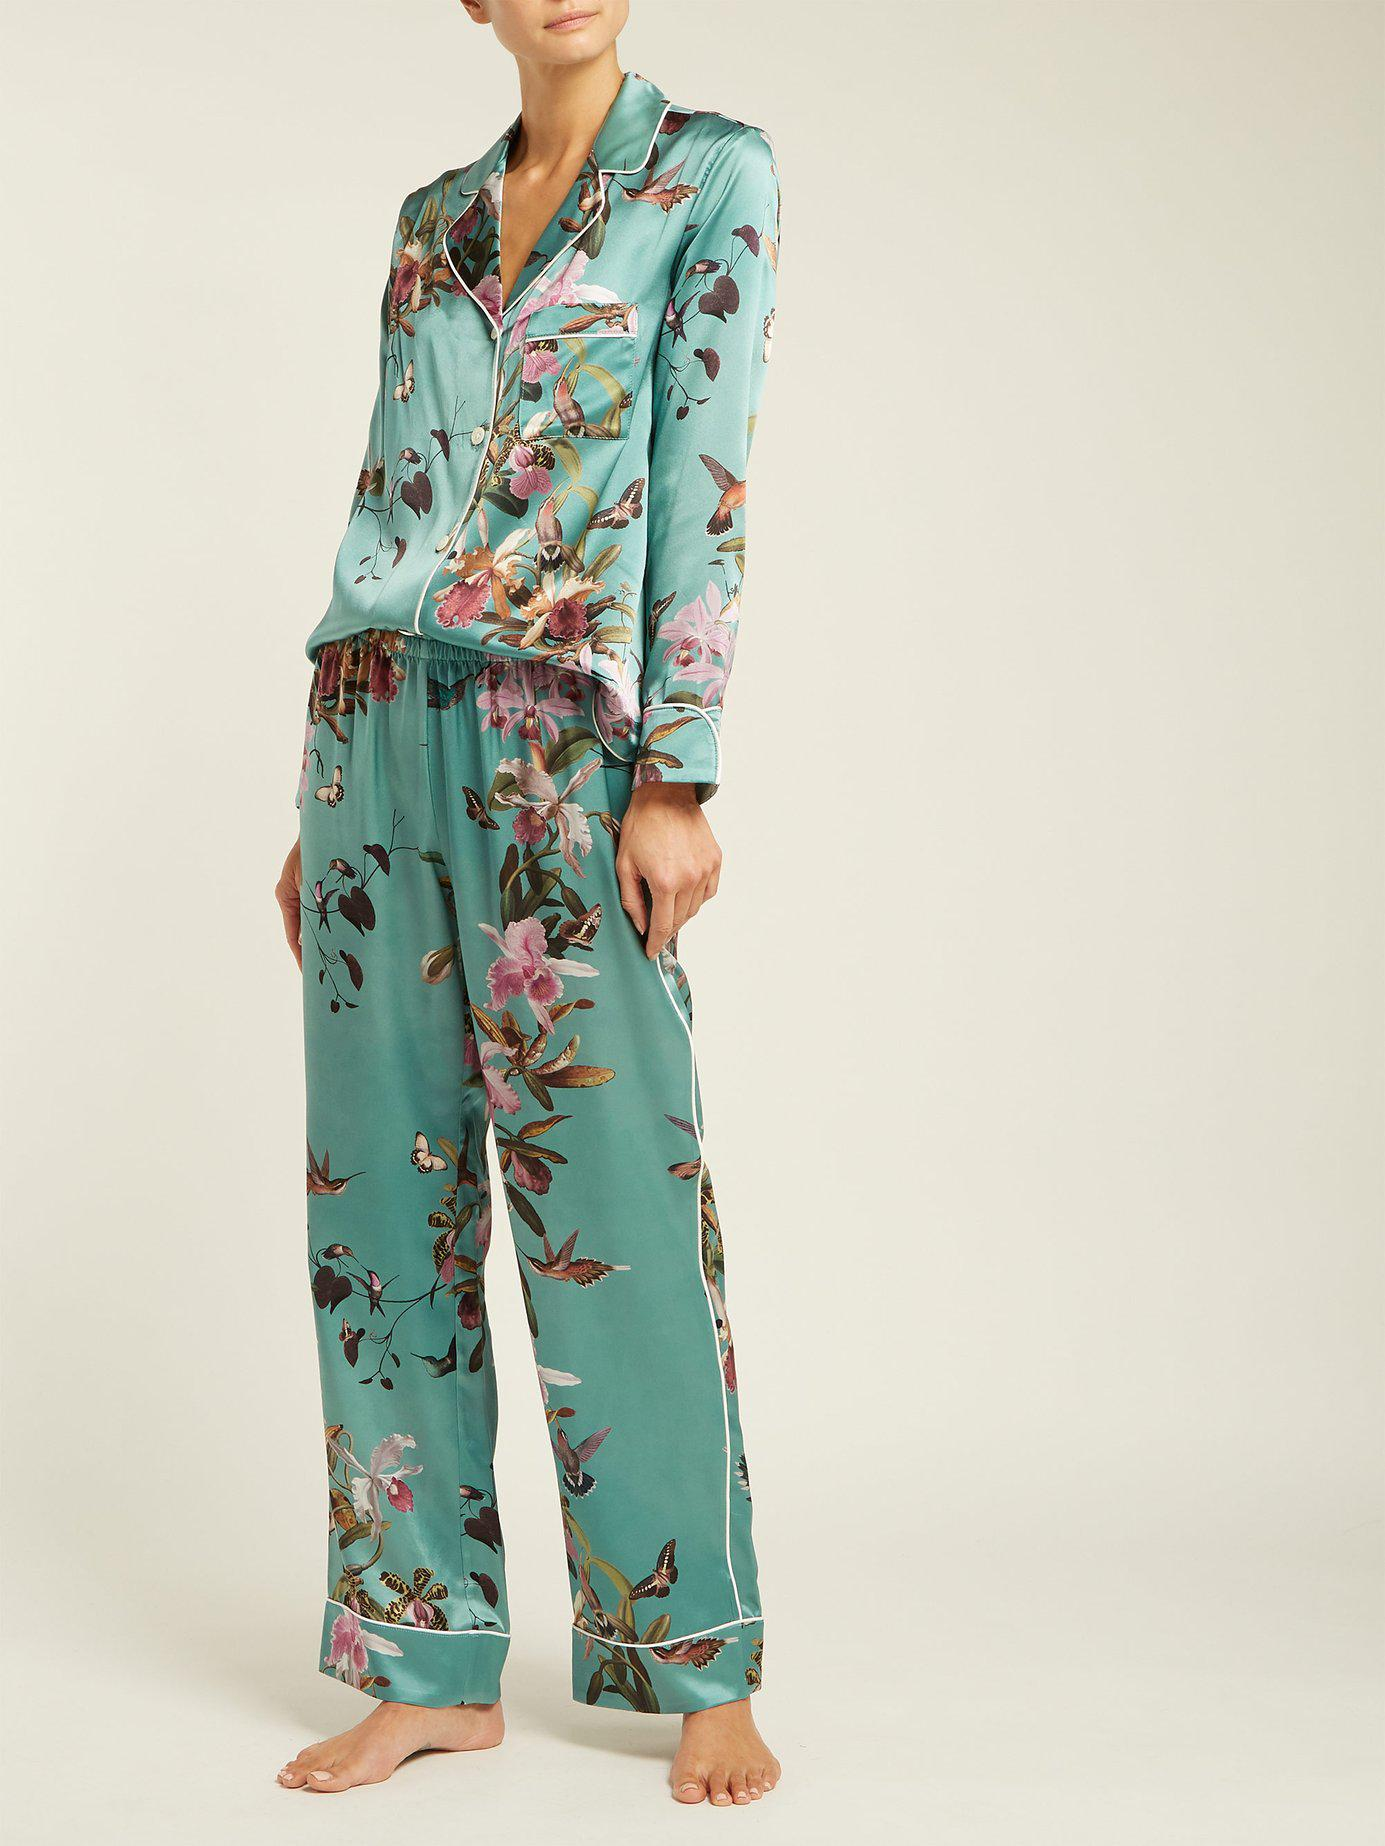 989013baca Morpho + Luna - Blue Colette Floral Print Silk Pyjamas - Lyst. View  fullscreen